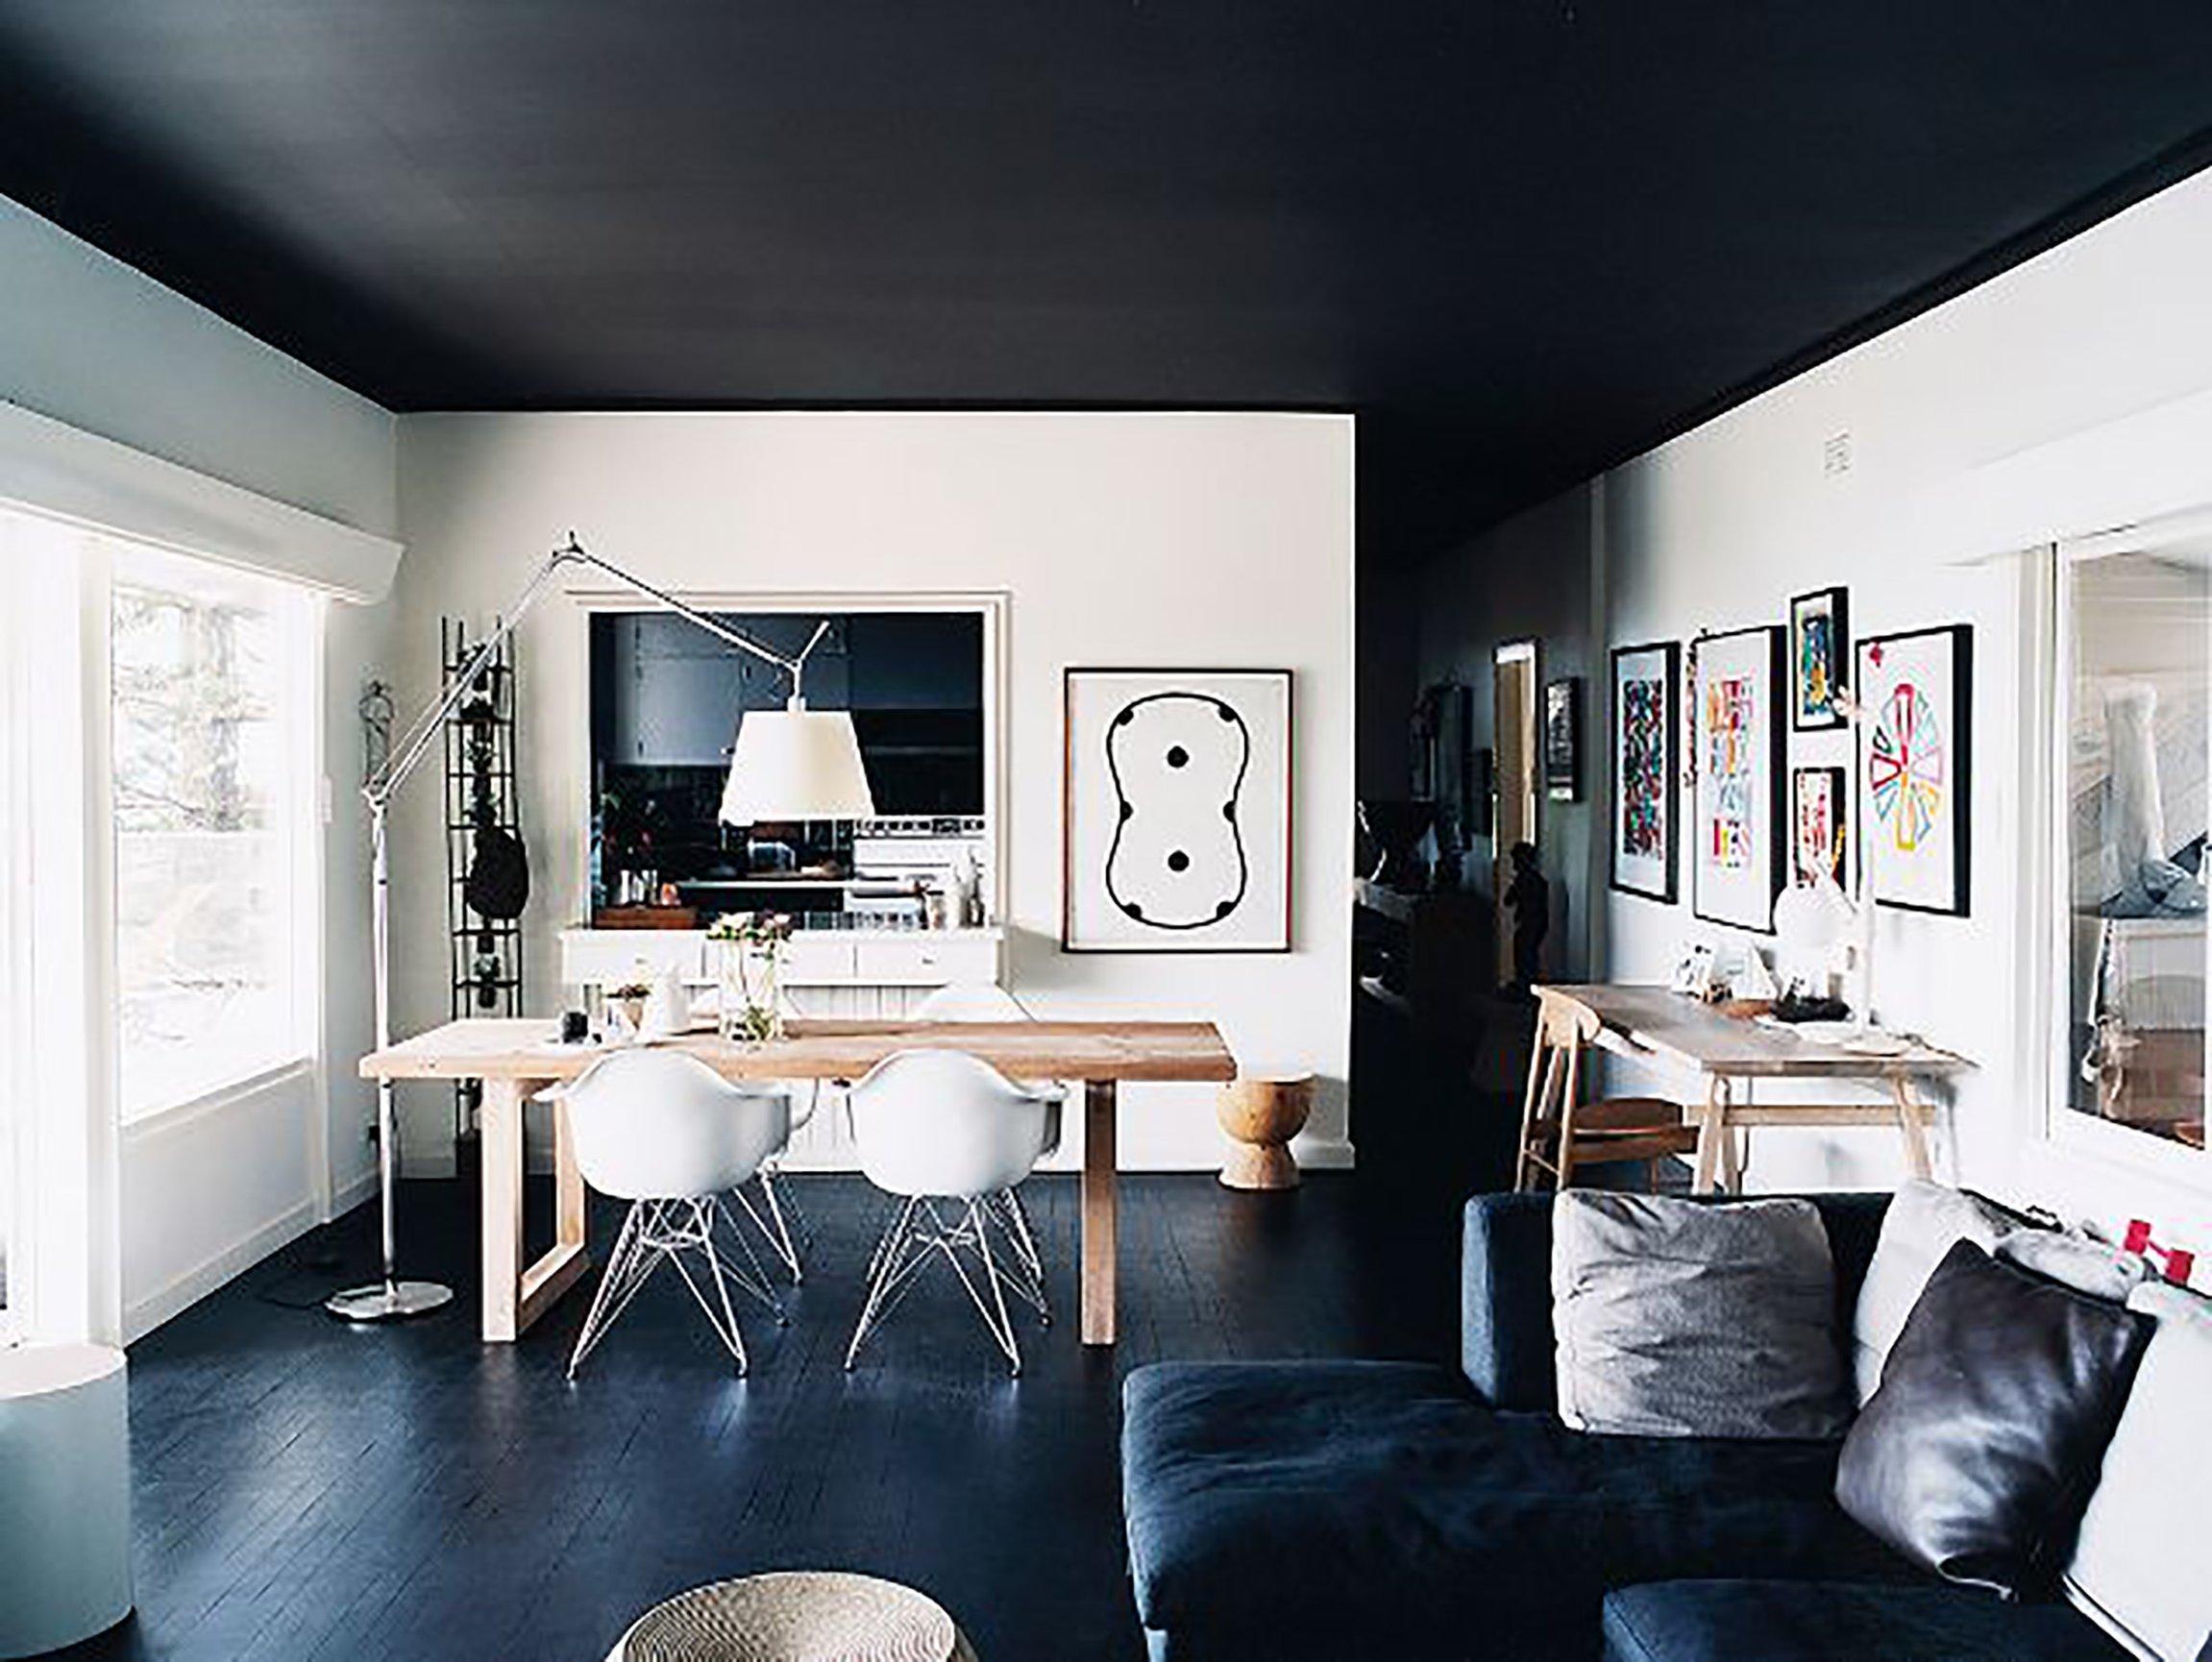 10 Interior Design Rules You Should Break